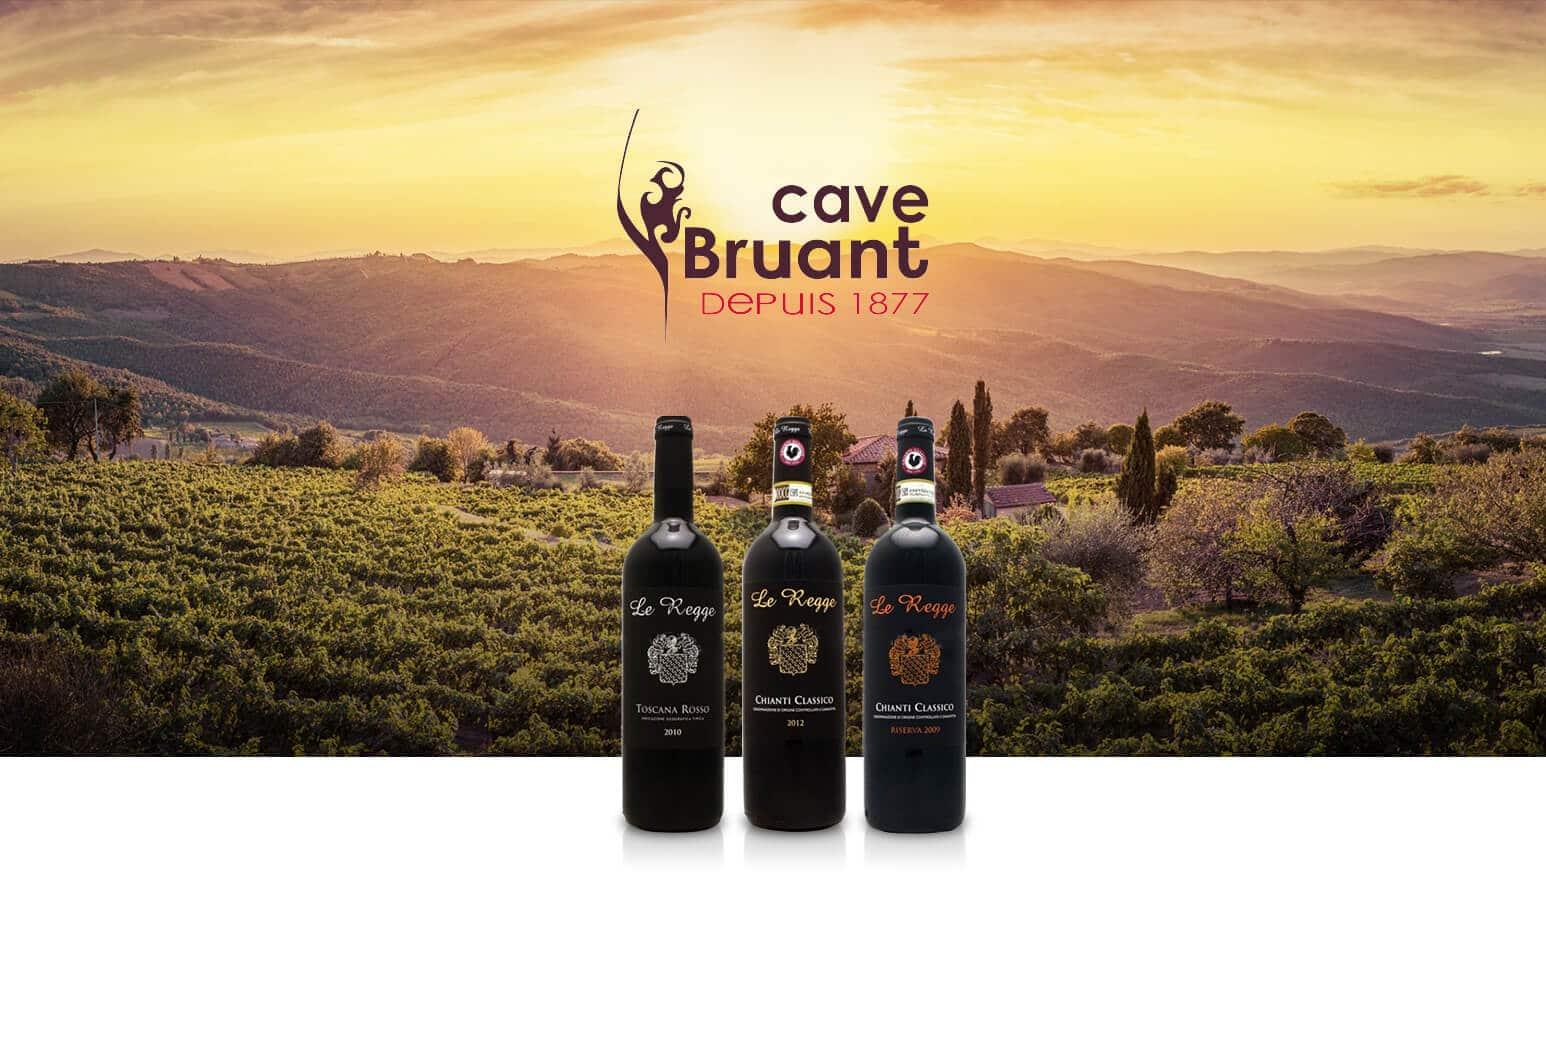 site e-commerce PrestaShop caviste Cavec Bruant